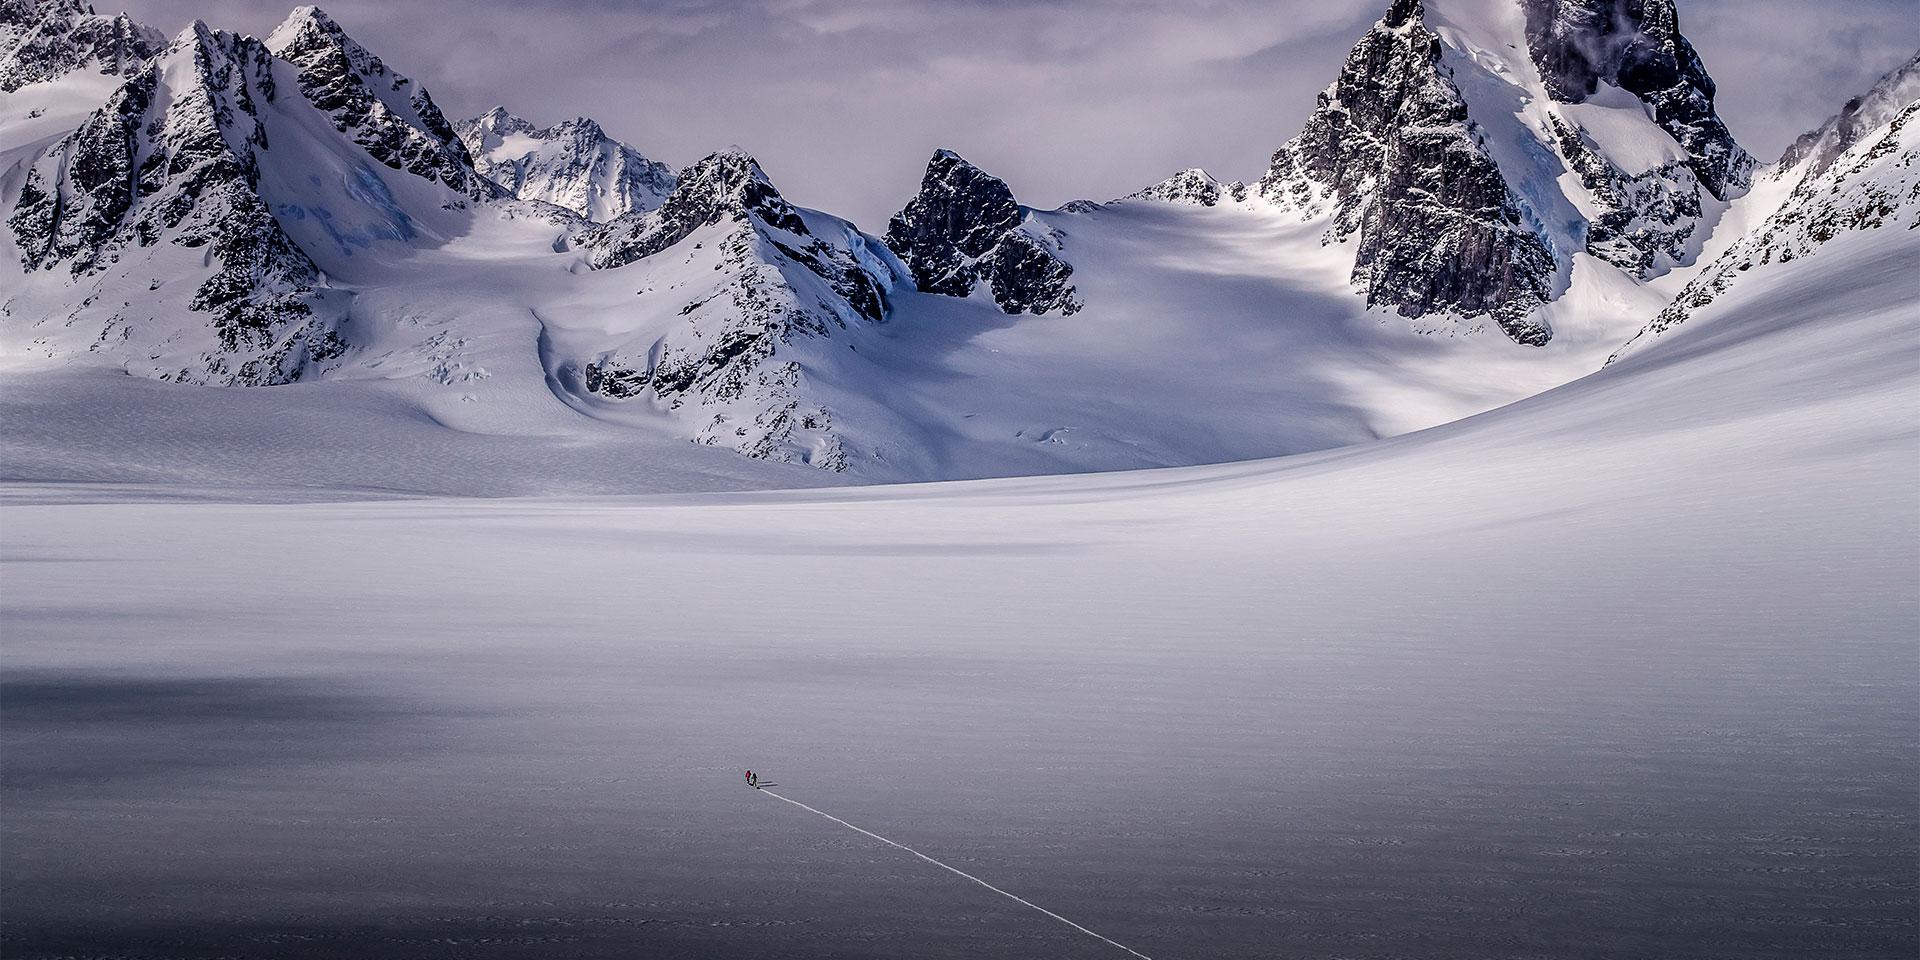 VIMFF-Fall-2018-This-Mountain-Life-featured-title-bg-1920x960.jpg